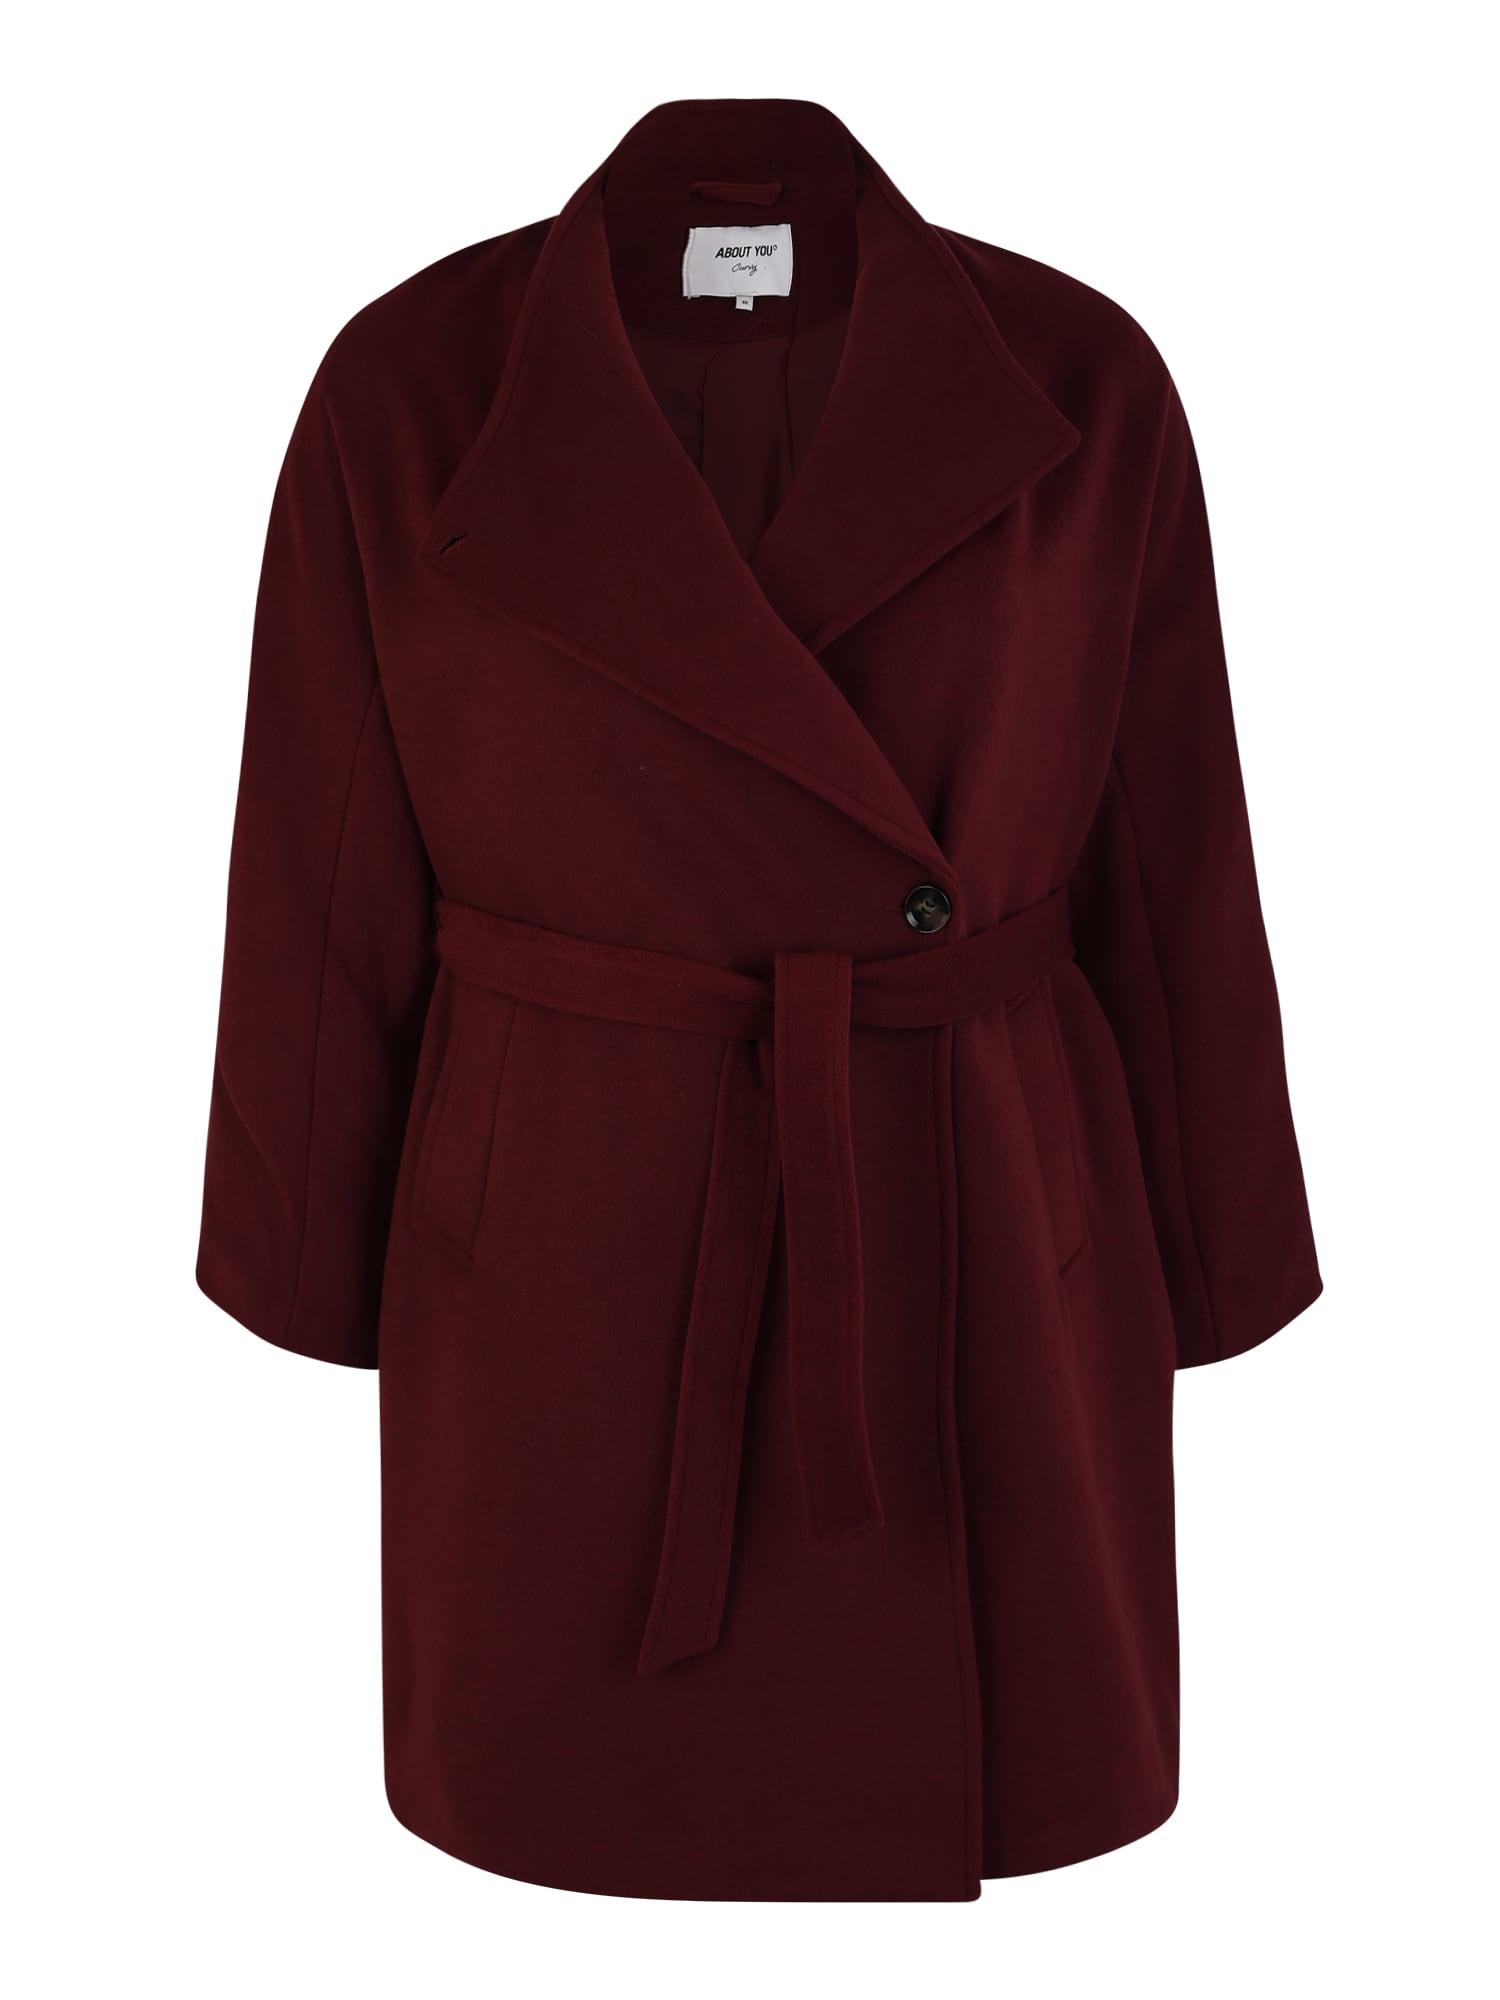 ABOUT YOU Curvy Rudeninis-žieminis paltas 'Charis Coat' burgundiško vyno spalva